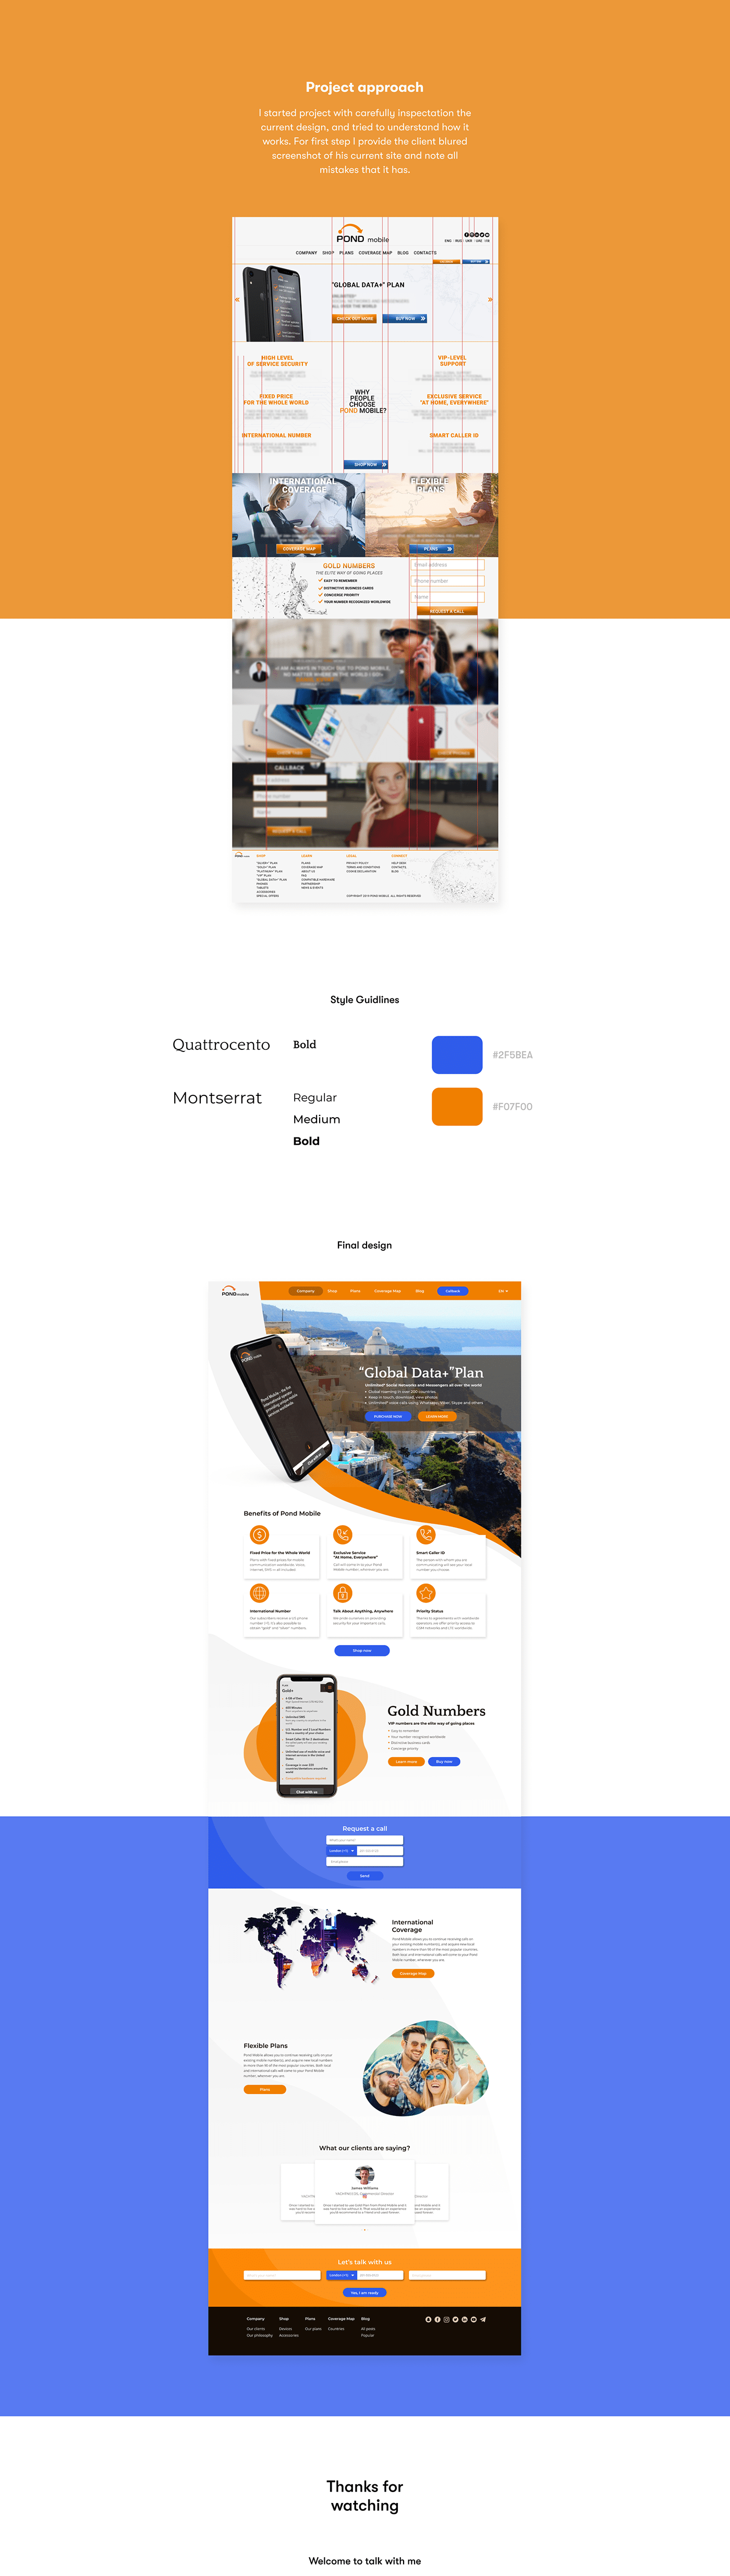 concept landing redesign service Travel UI ux Web Design